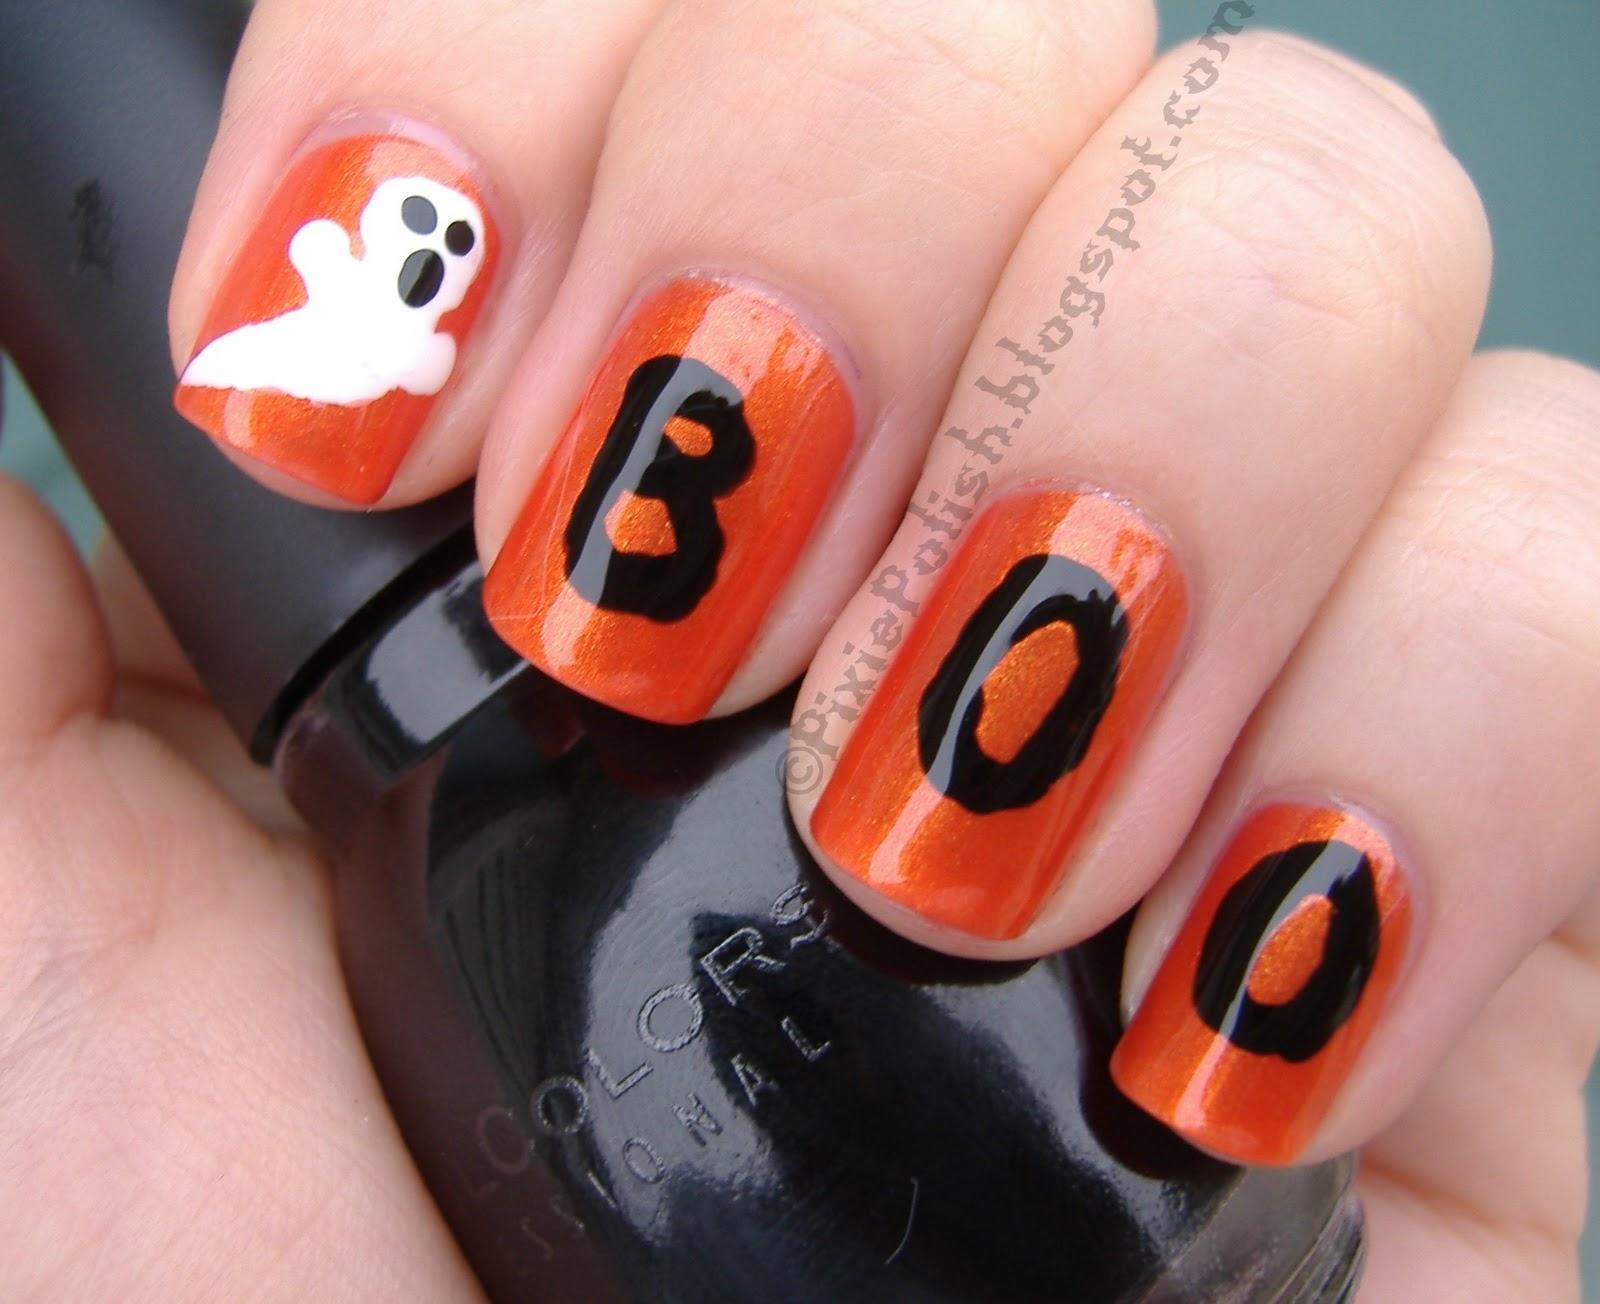 Halloween nails art design nail designs hair styles tattoos and fashion heartbeats - Nail art halloween ...